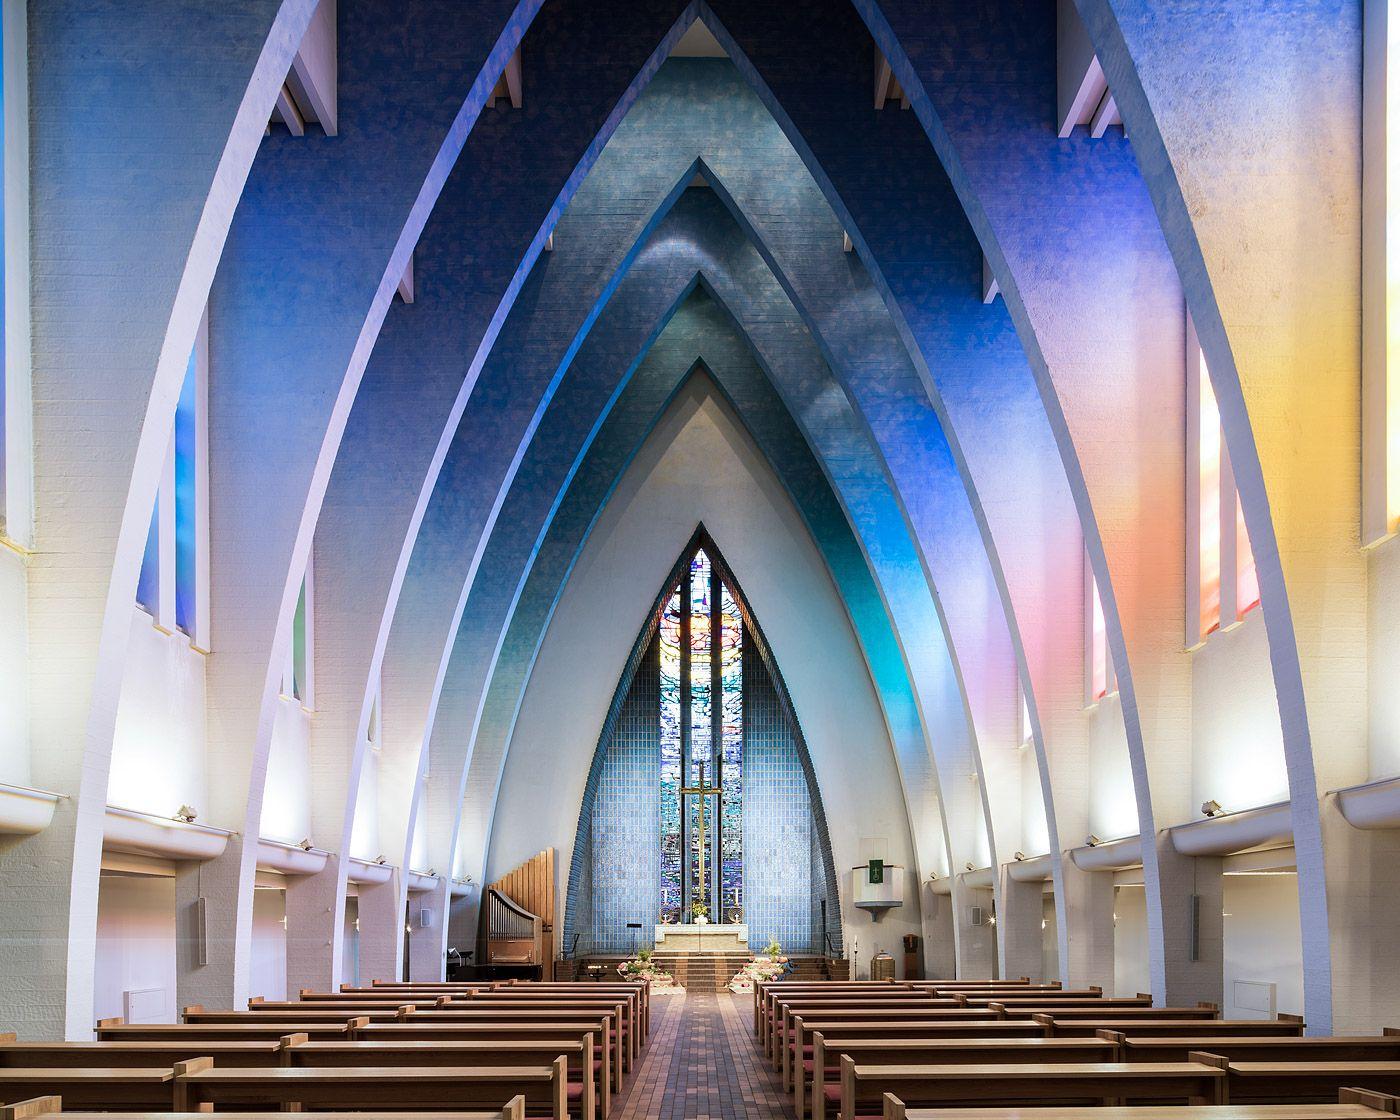 Architecture Photography Series hohenzollernplatz church, from berlin interiors series